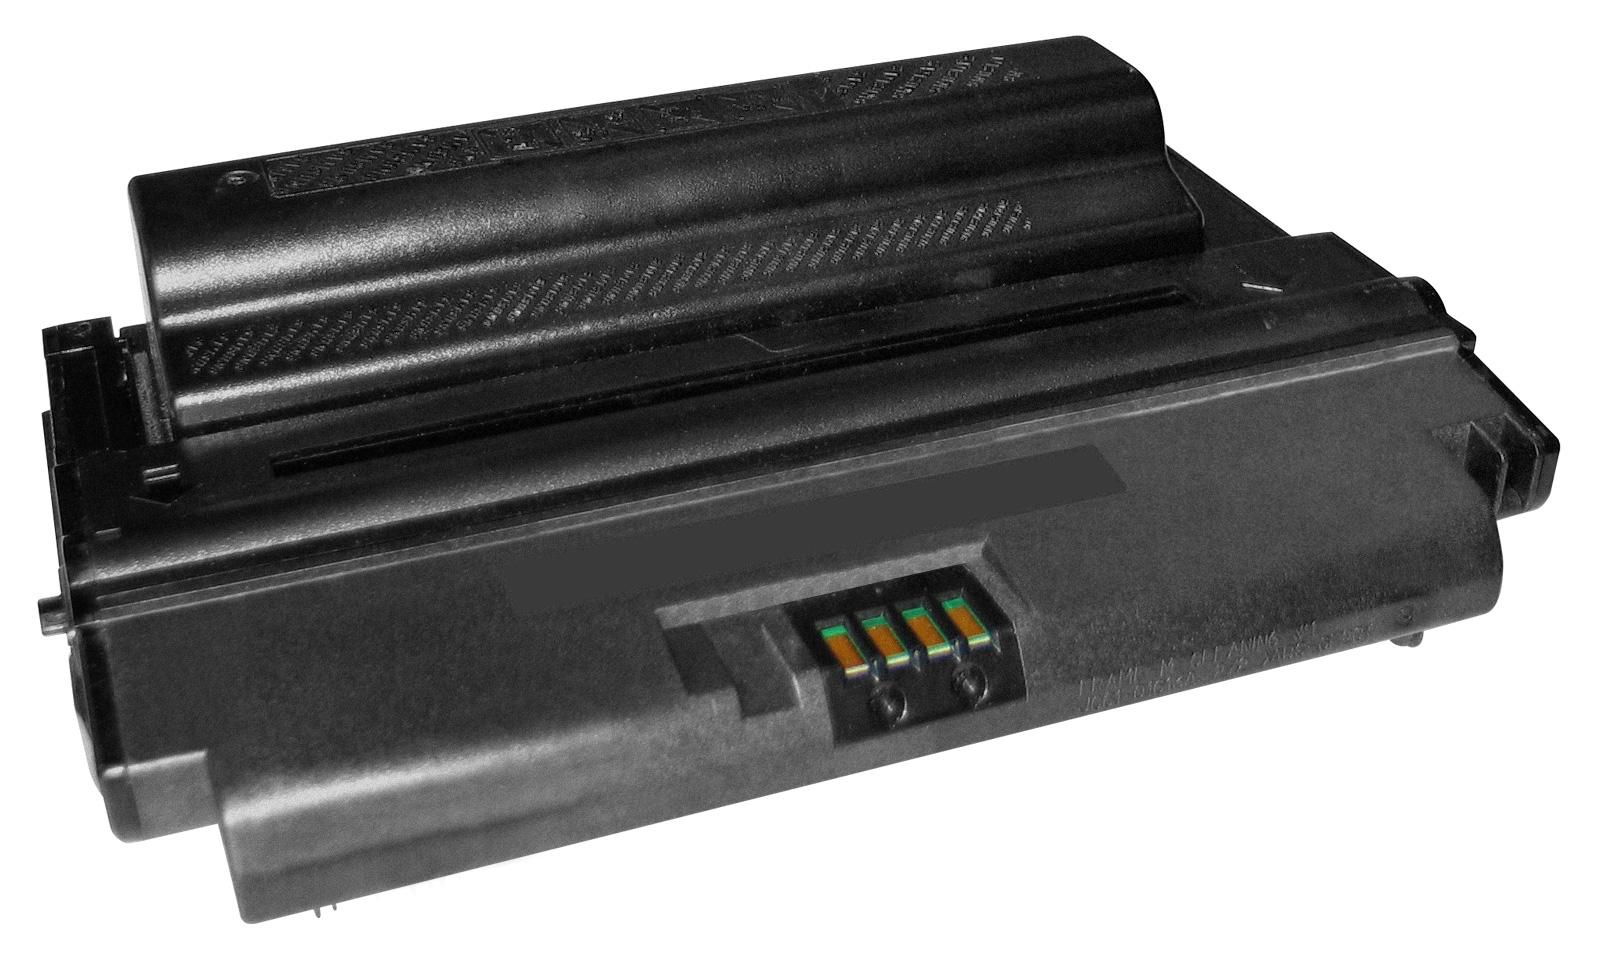 Yaha Toner Sort Høykapasitet (8.000 sider), erstatter Samsung ML-D3050B Y12428